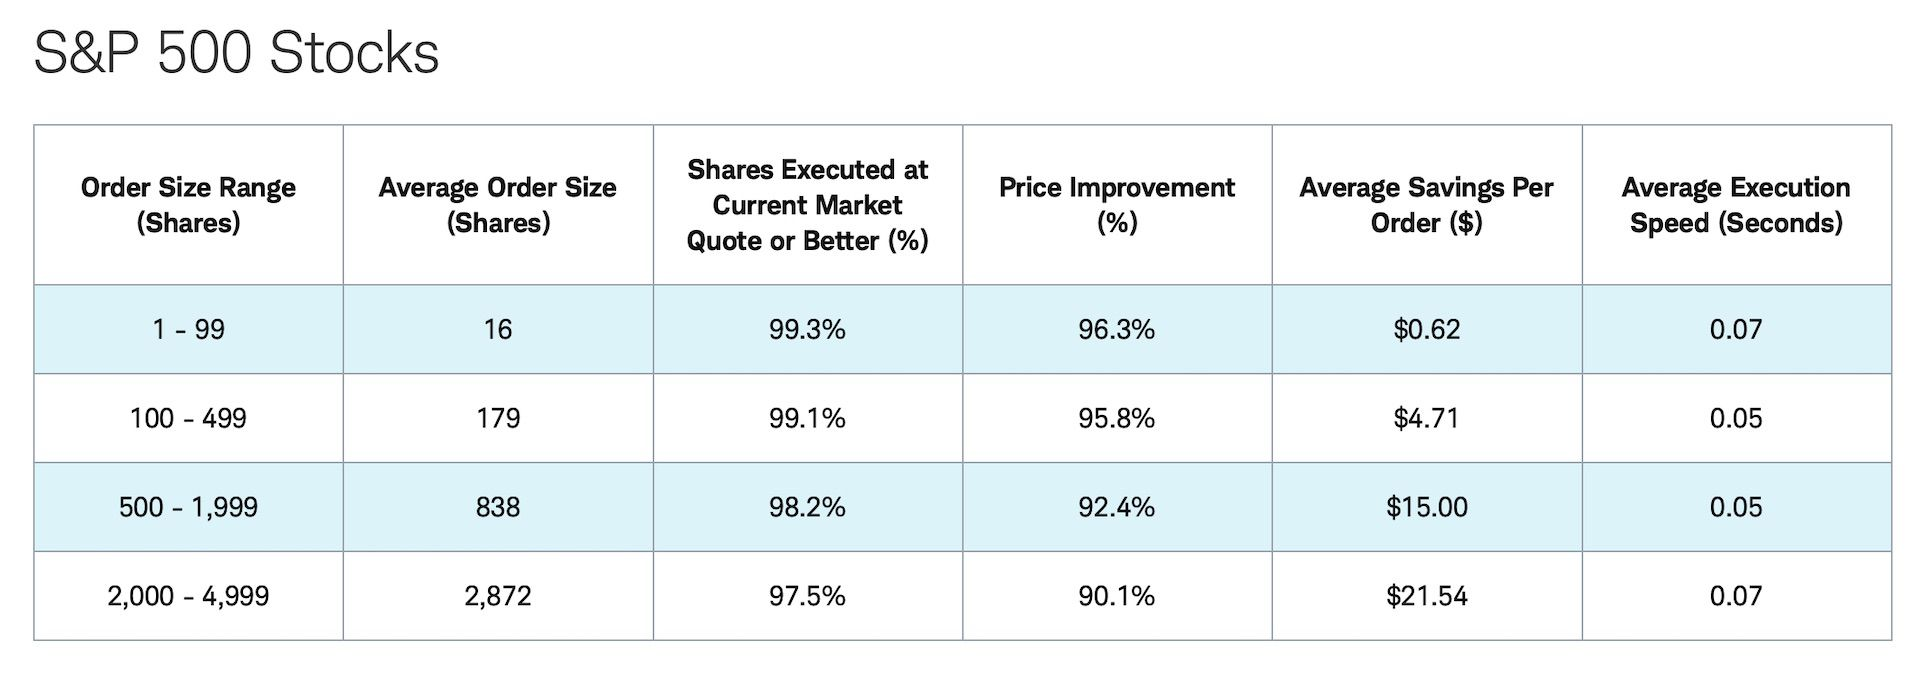 Schwab Retail Execution Quality Statistics (Q2 2021)